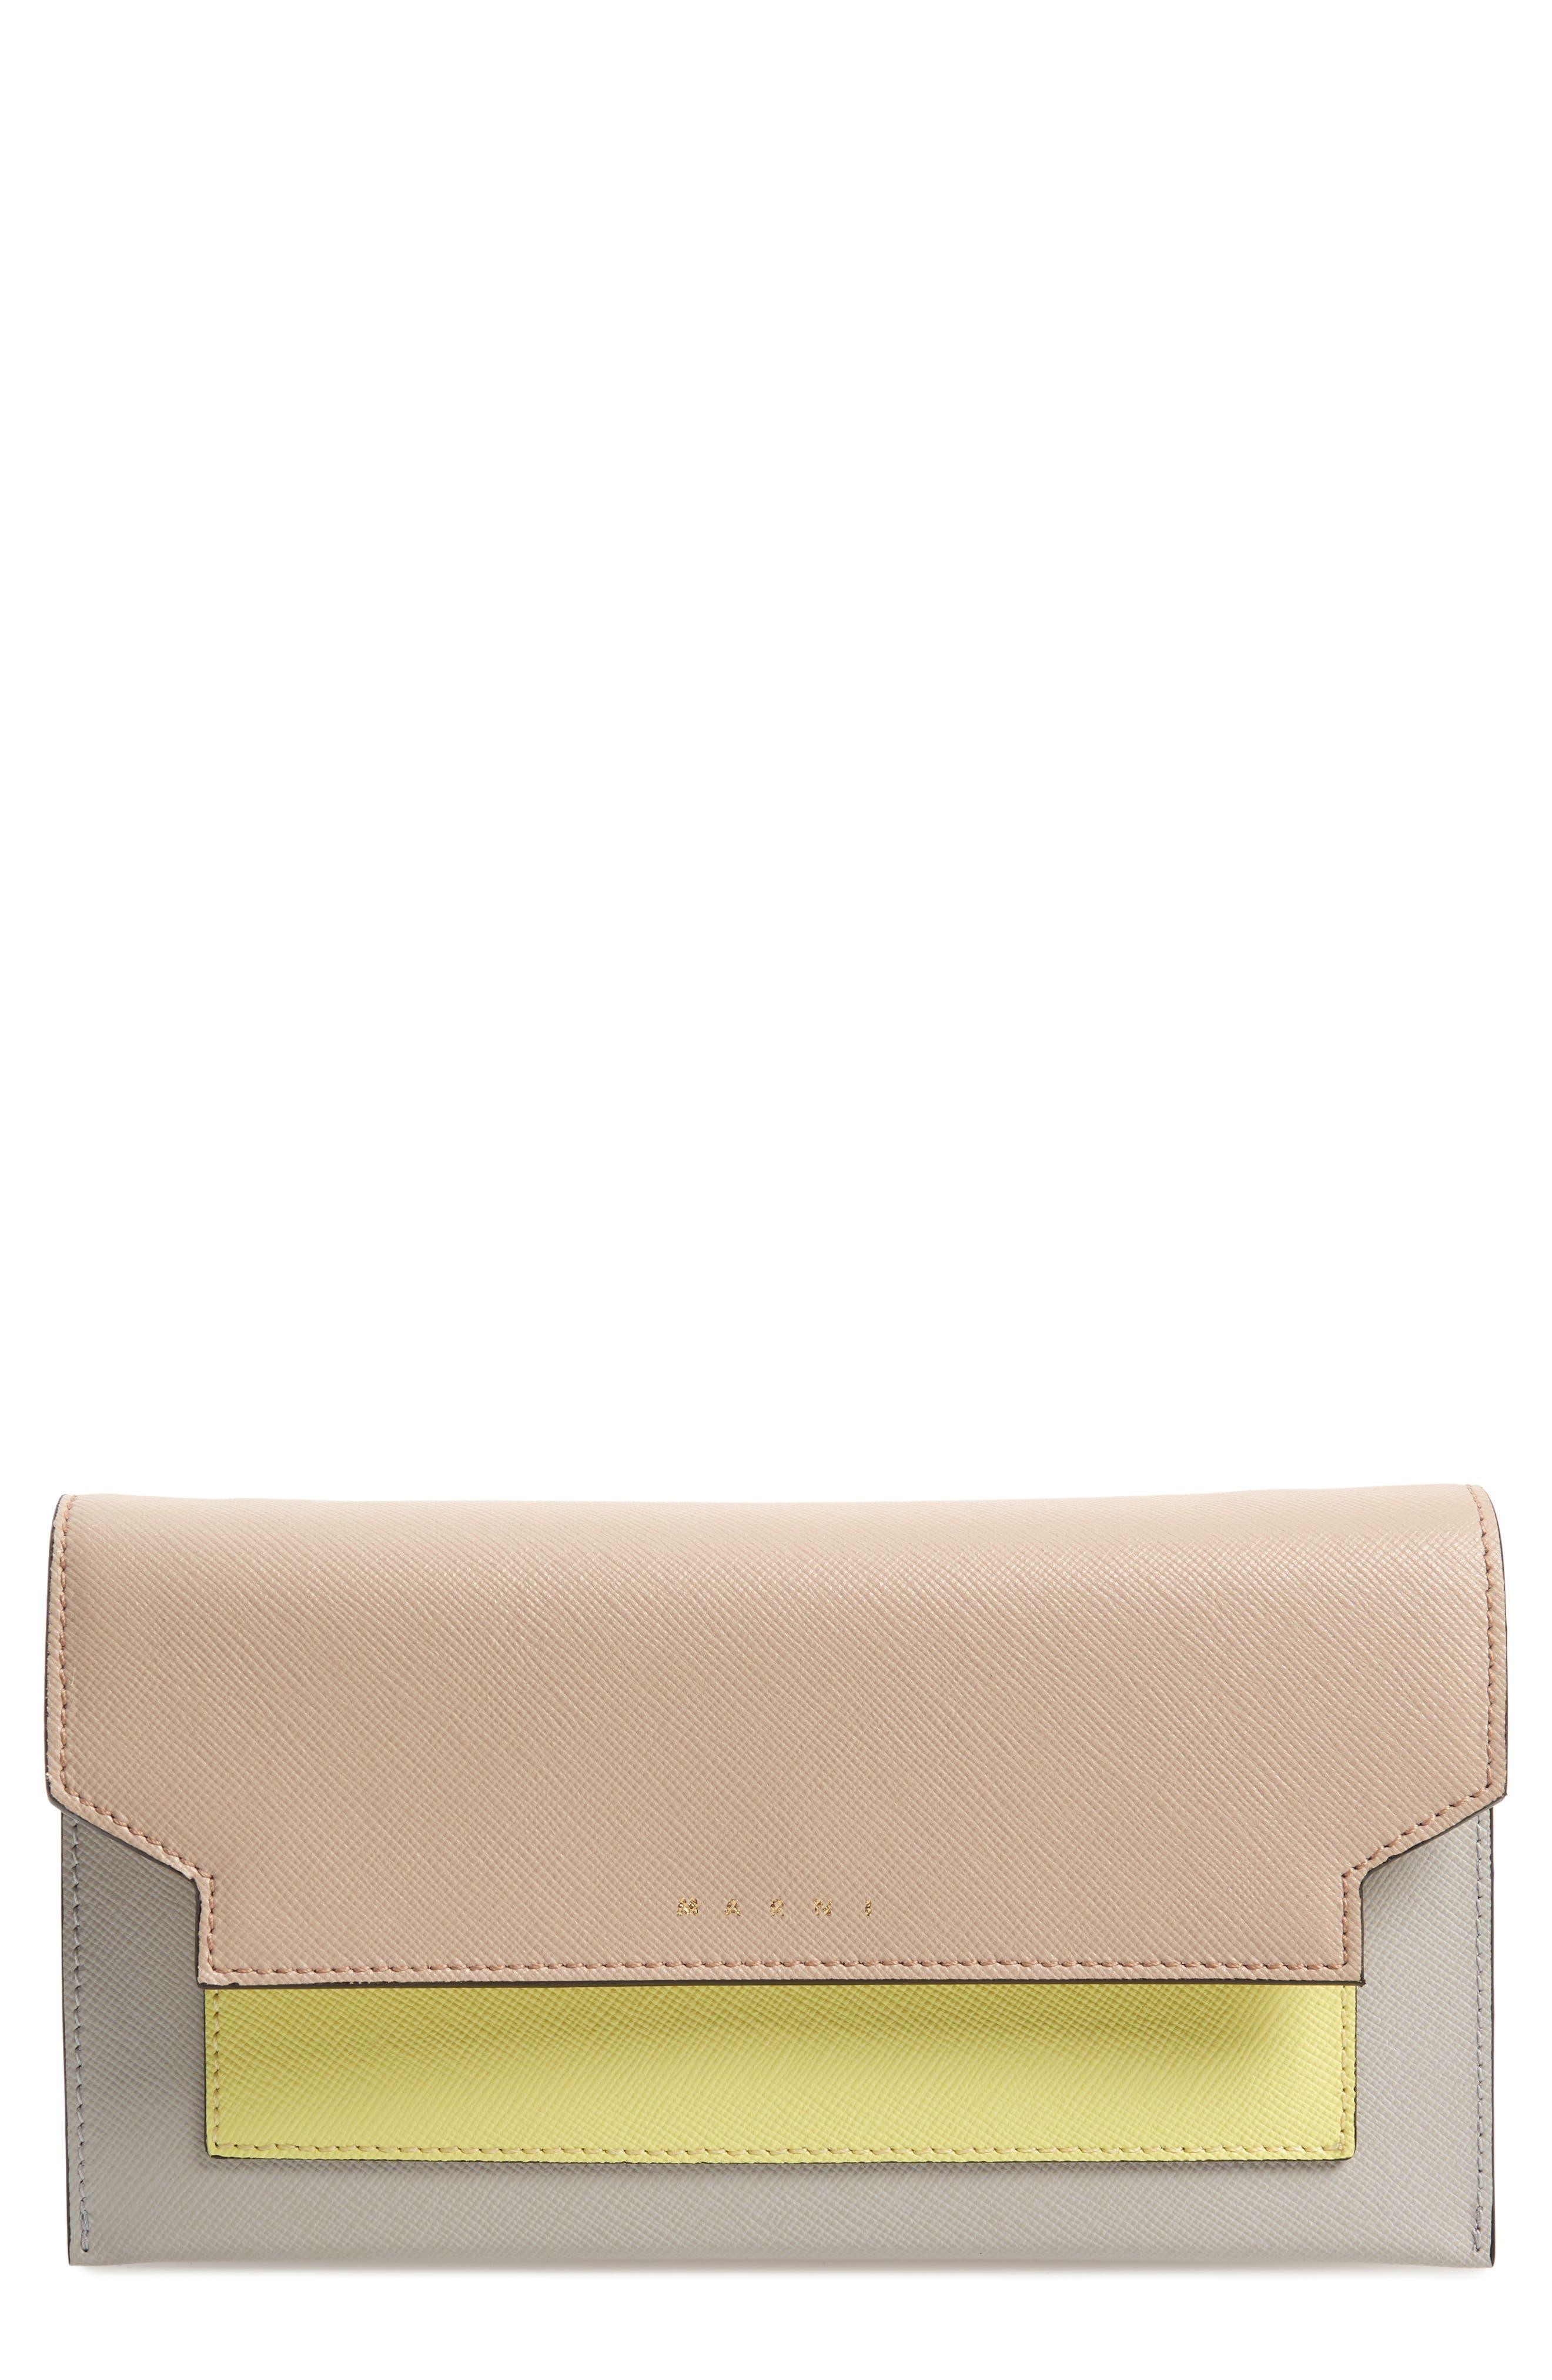 Trunk Leather Crossbody Wallet,                             Main thumbnail 1, color,                             LIGHT CAMEL/ VANILLA/ PELICAN